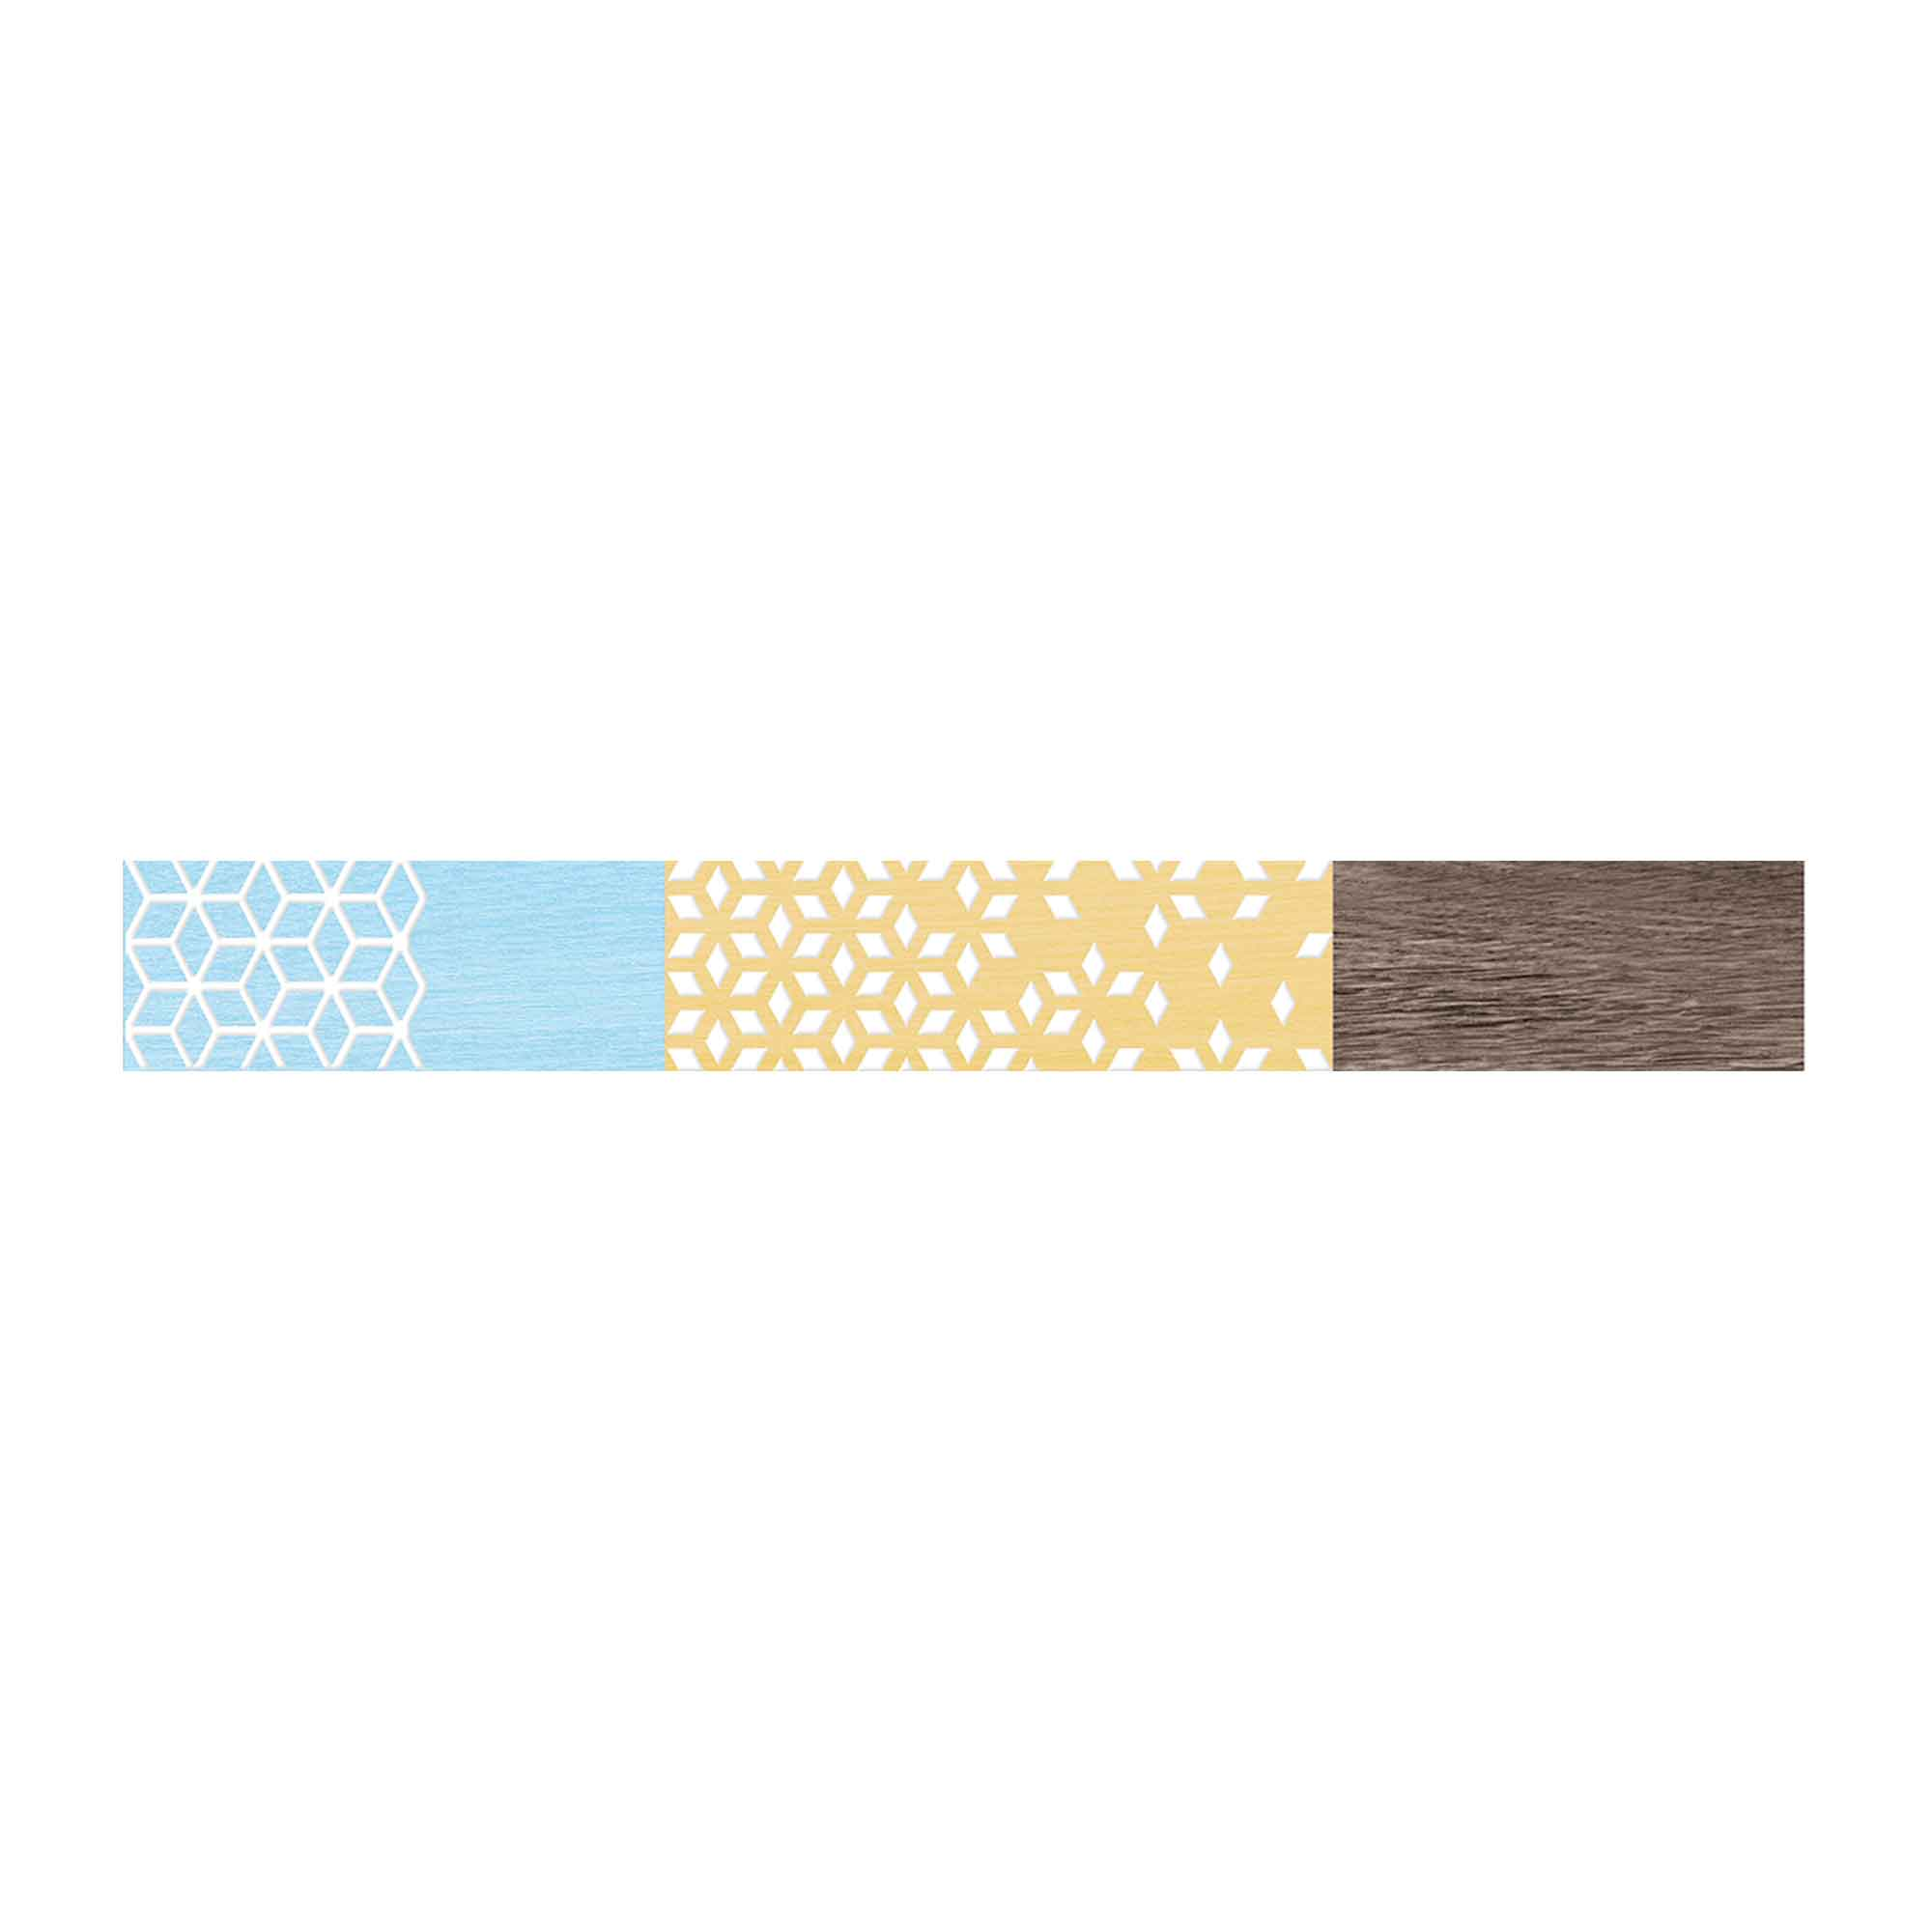 Brau faianta multicolor, Cesarom Nordic Wood, lucios, 5 x 40,2 cm